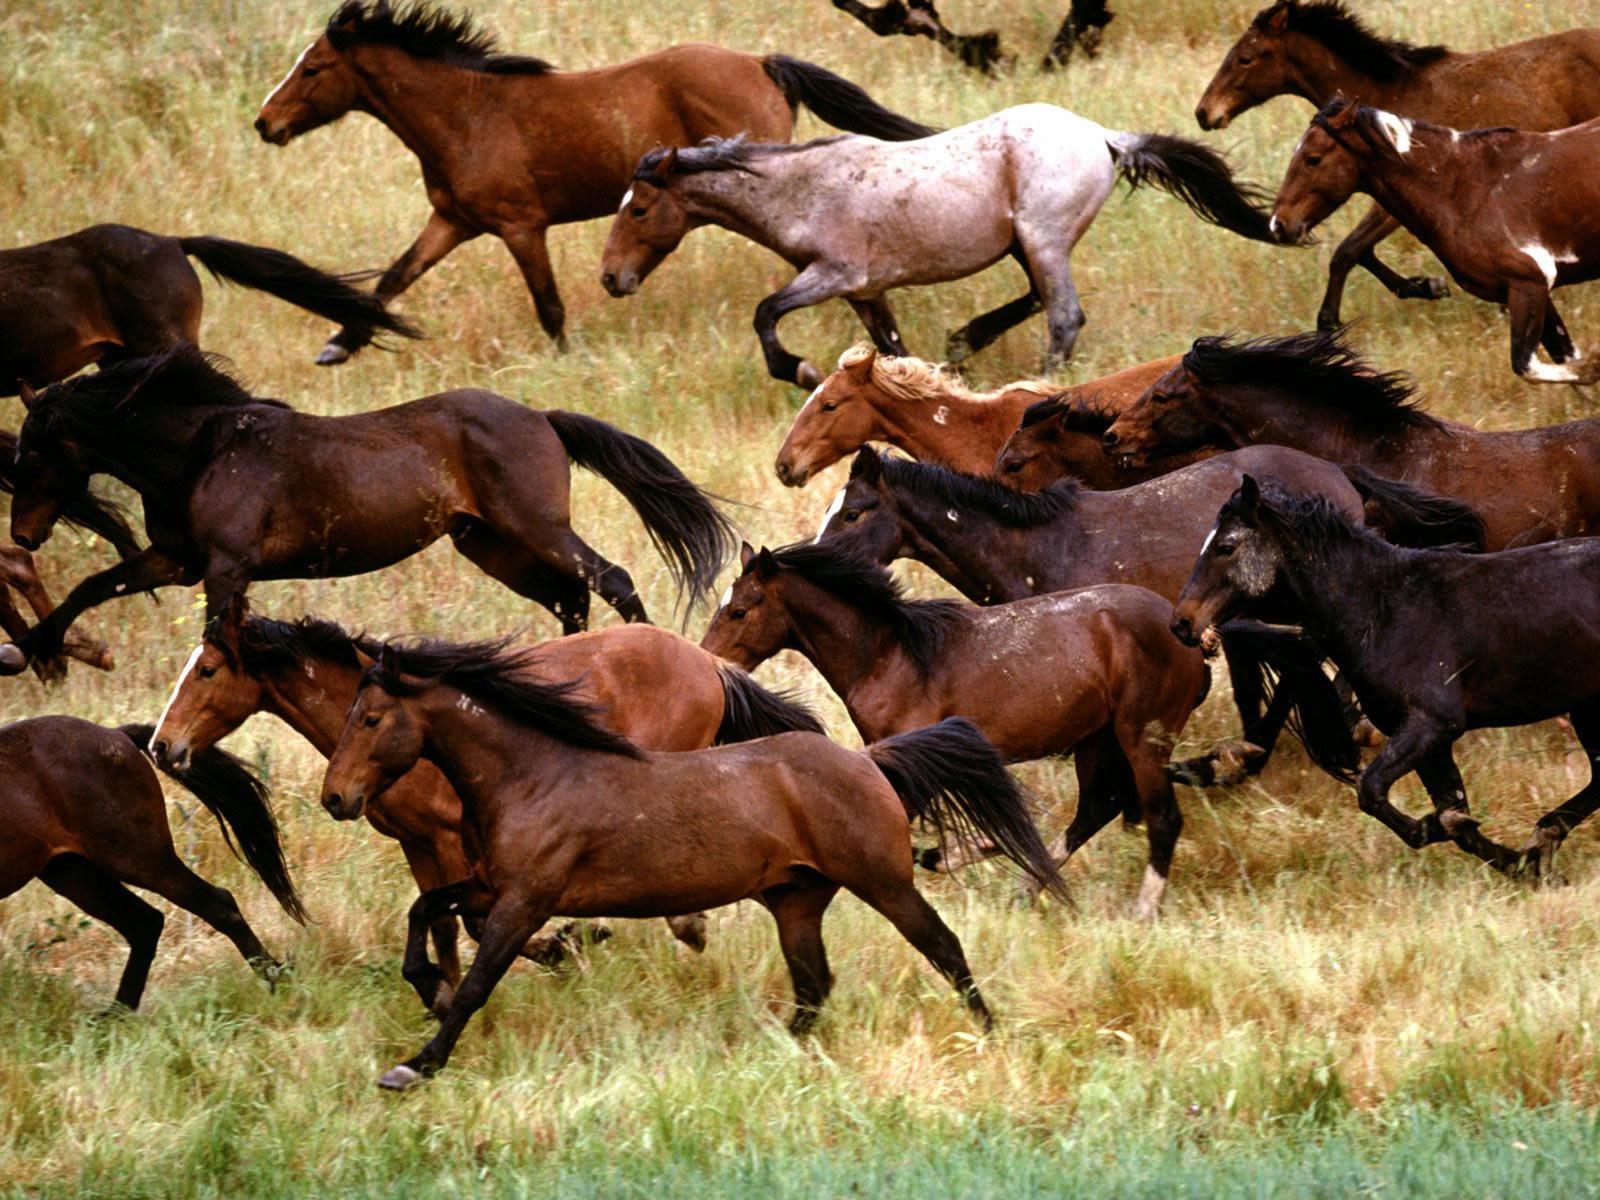 Wild Mustangs Gardner Ranch California - animals wallpaper image with ...